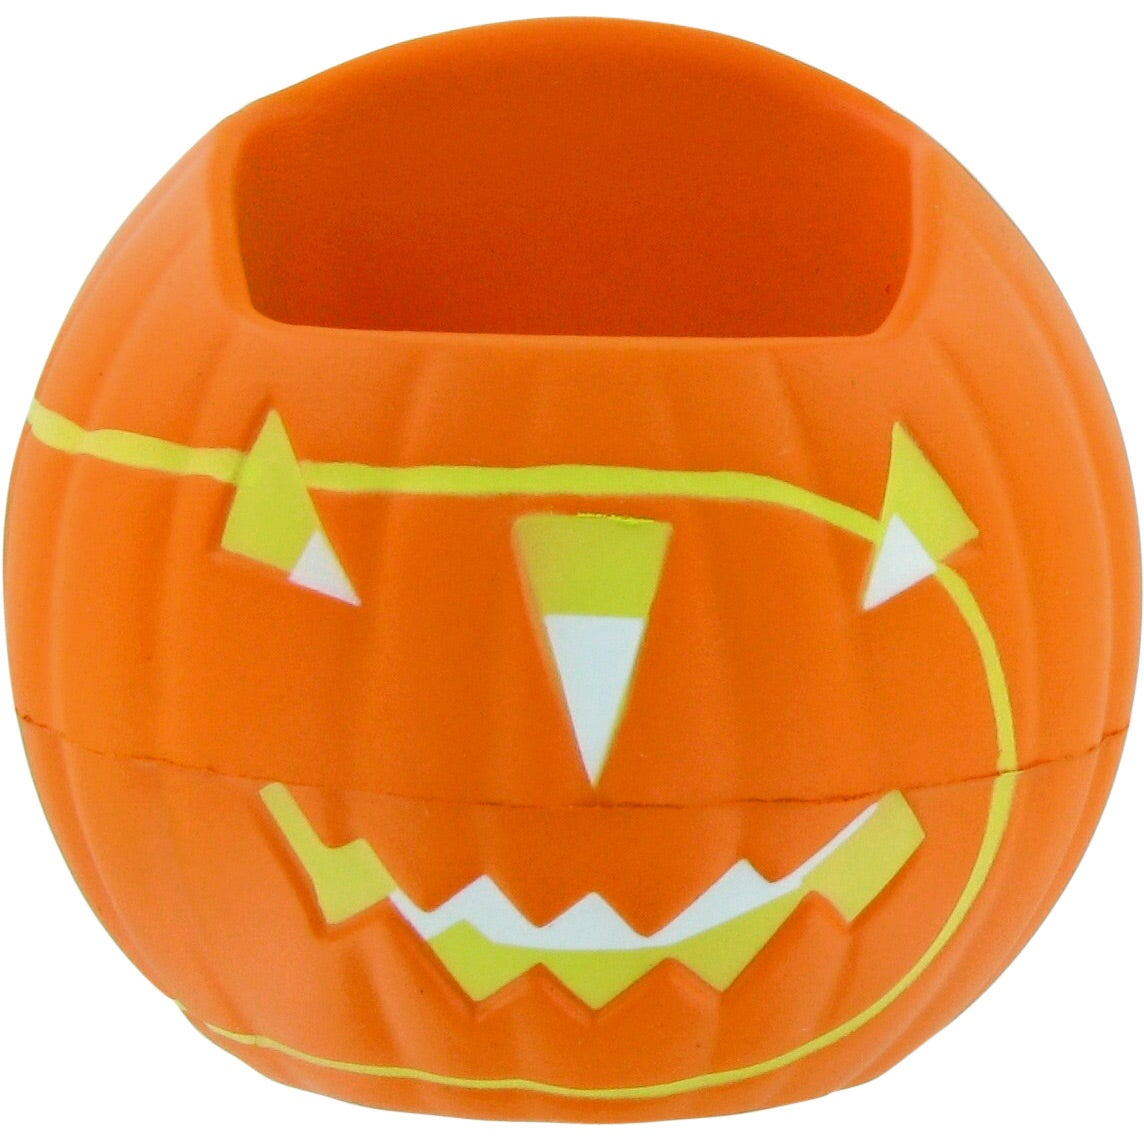 Pumpkin Cell Phone Holder Stress Toy